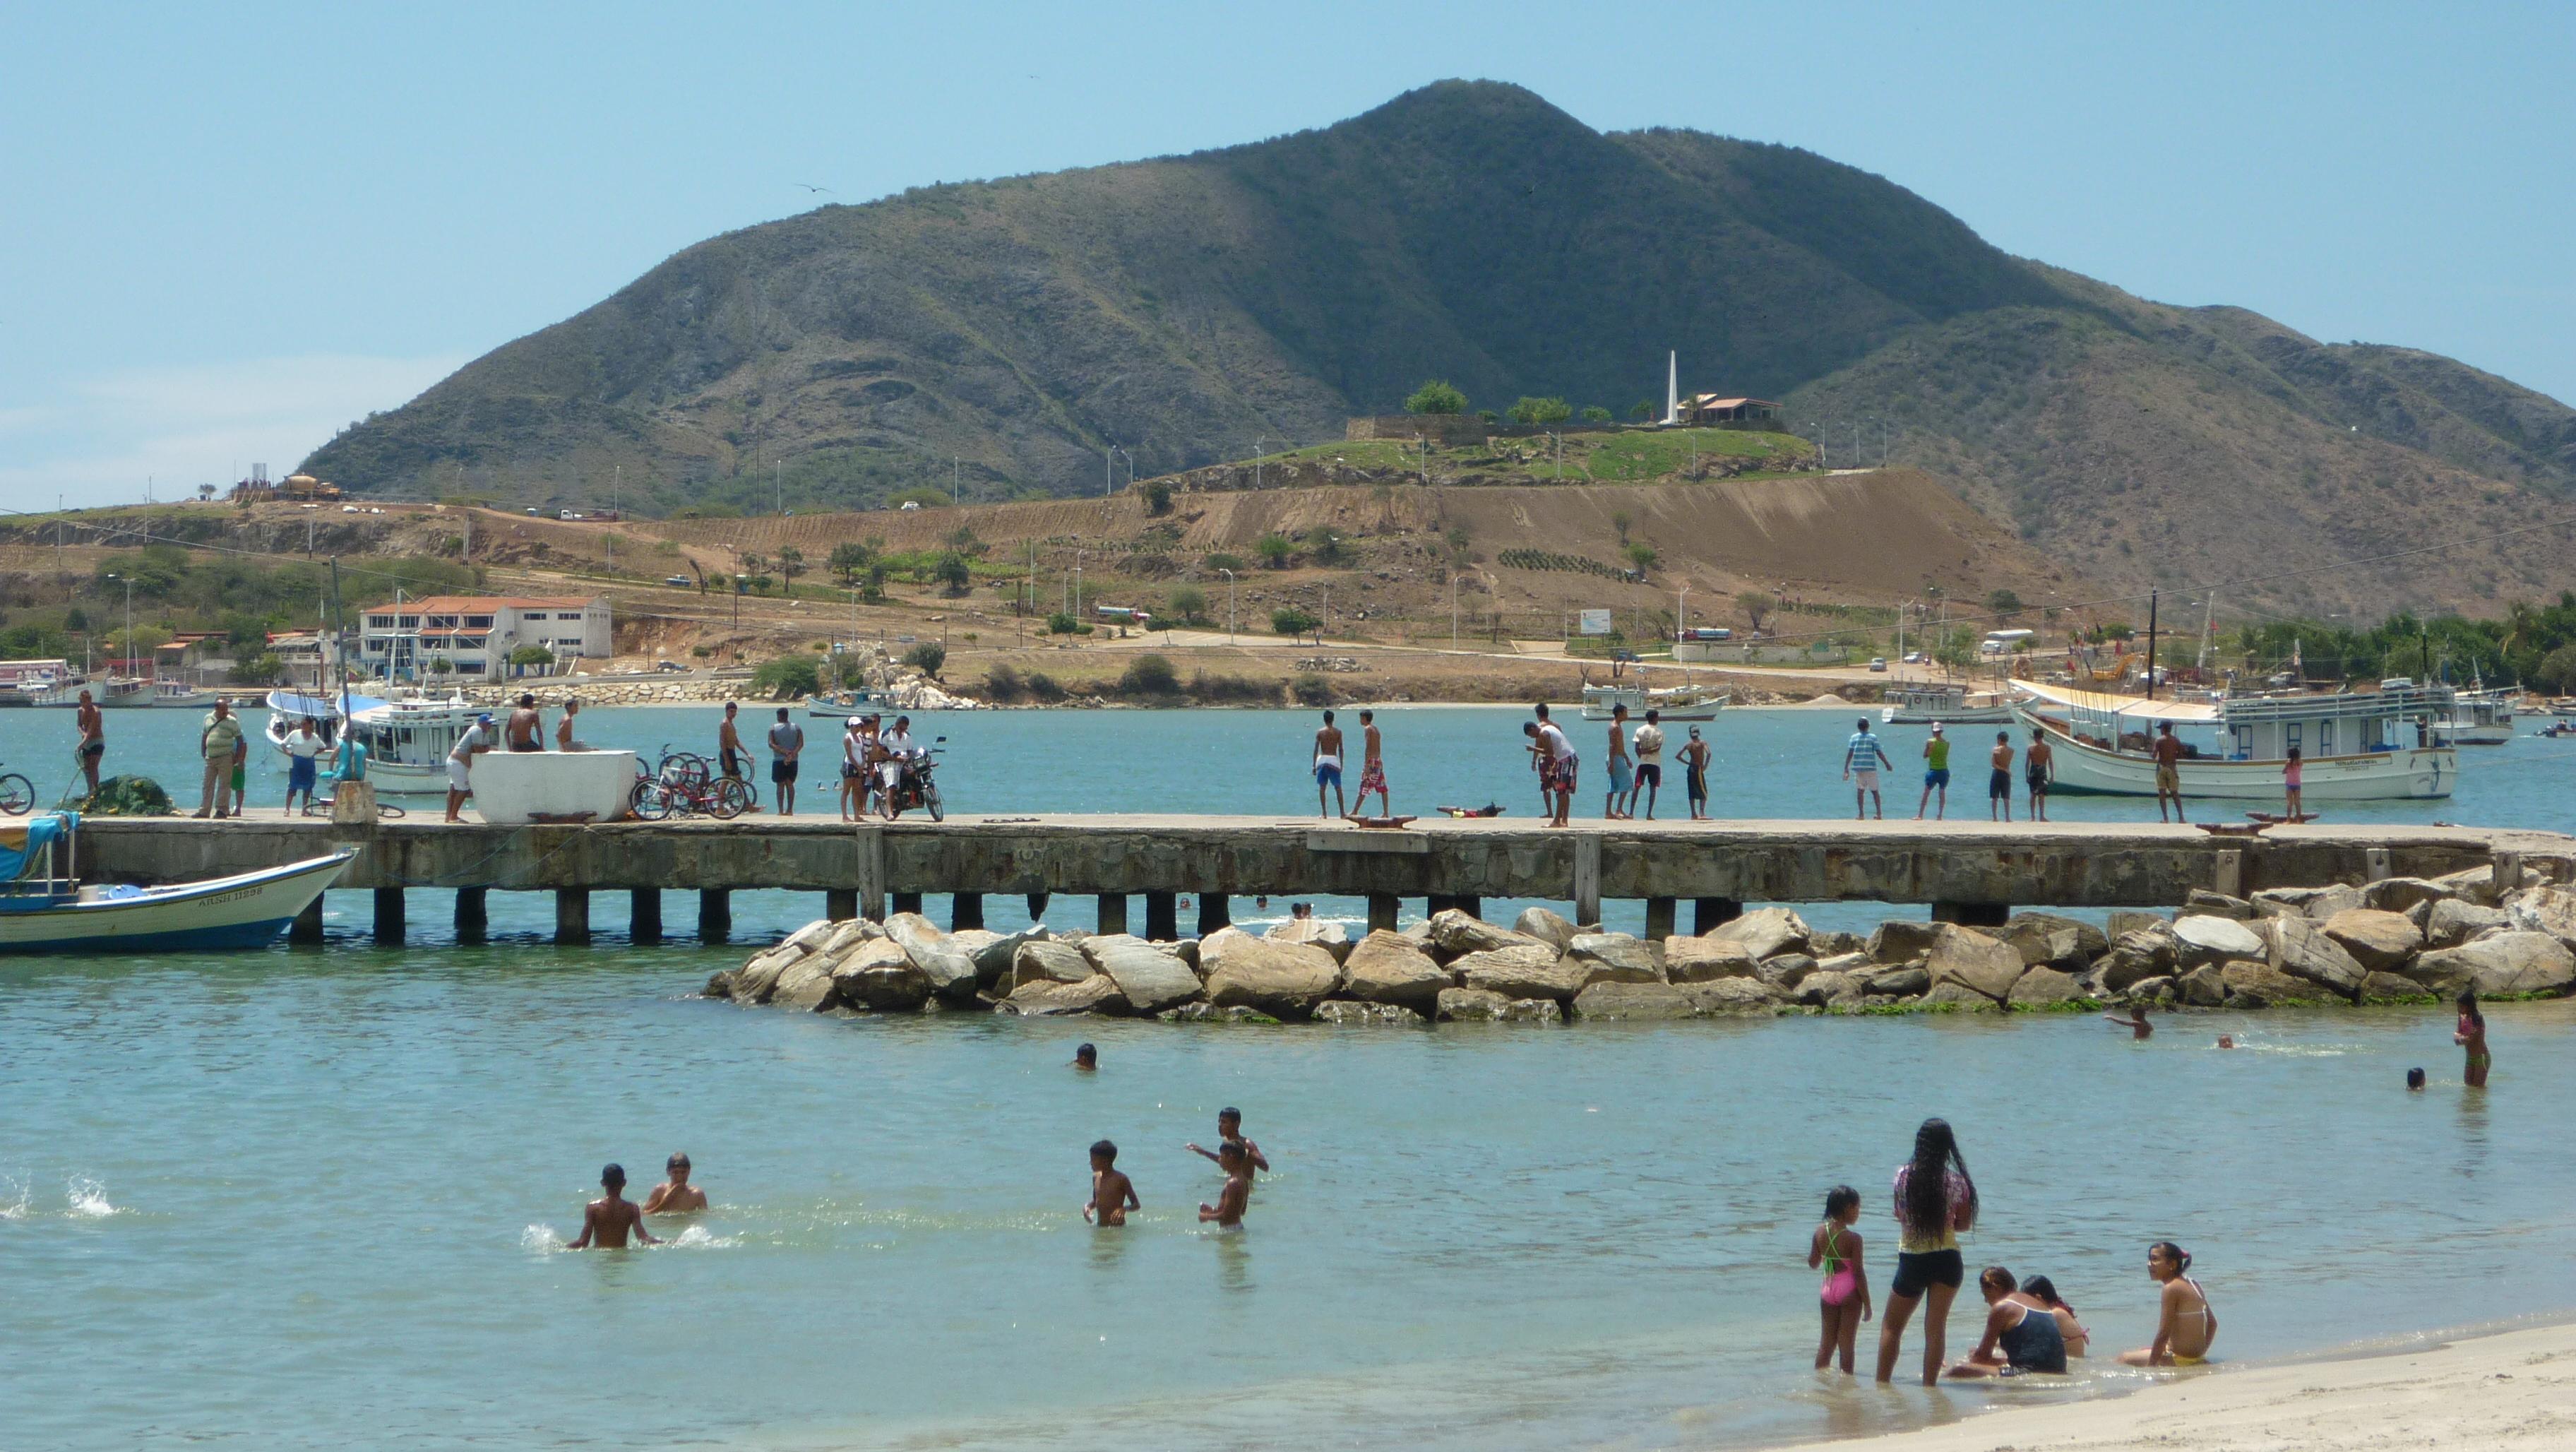 Außergewöhnlich File:Muelle de Juan Griego isla de Margarita.jpg - Wikimedia Commons @AO_31